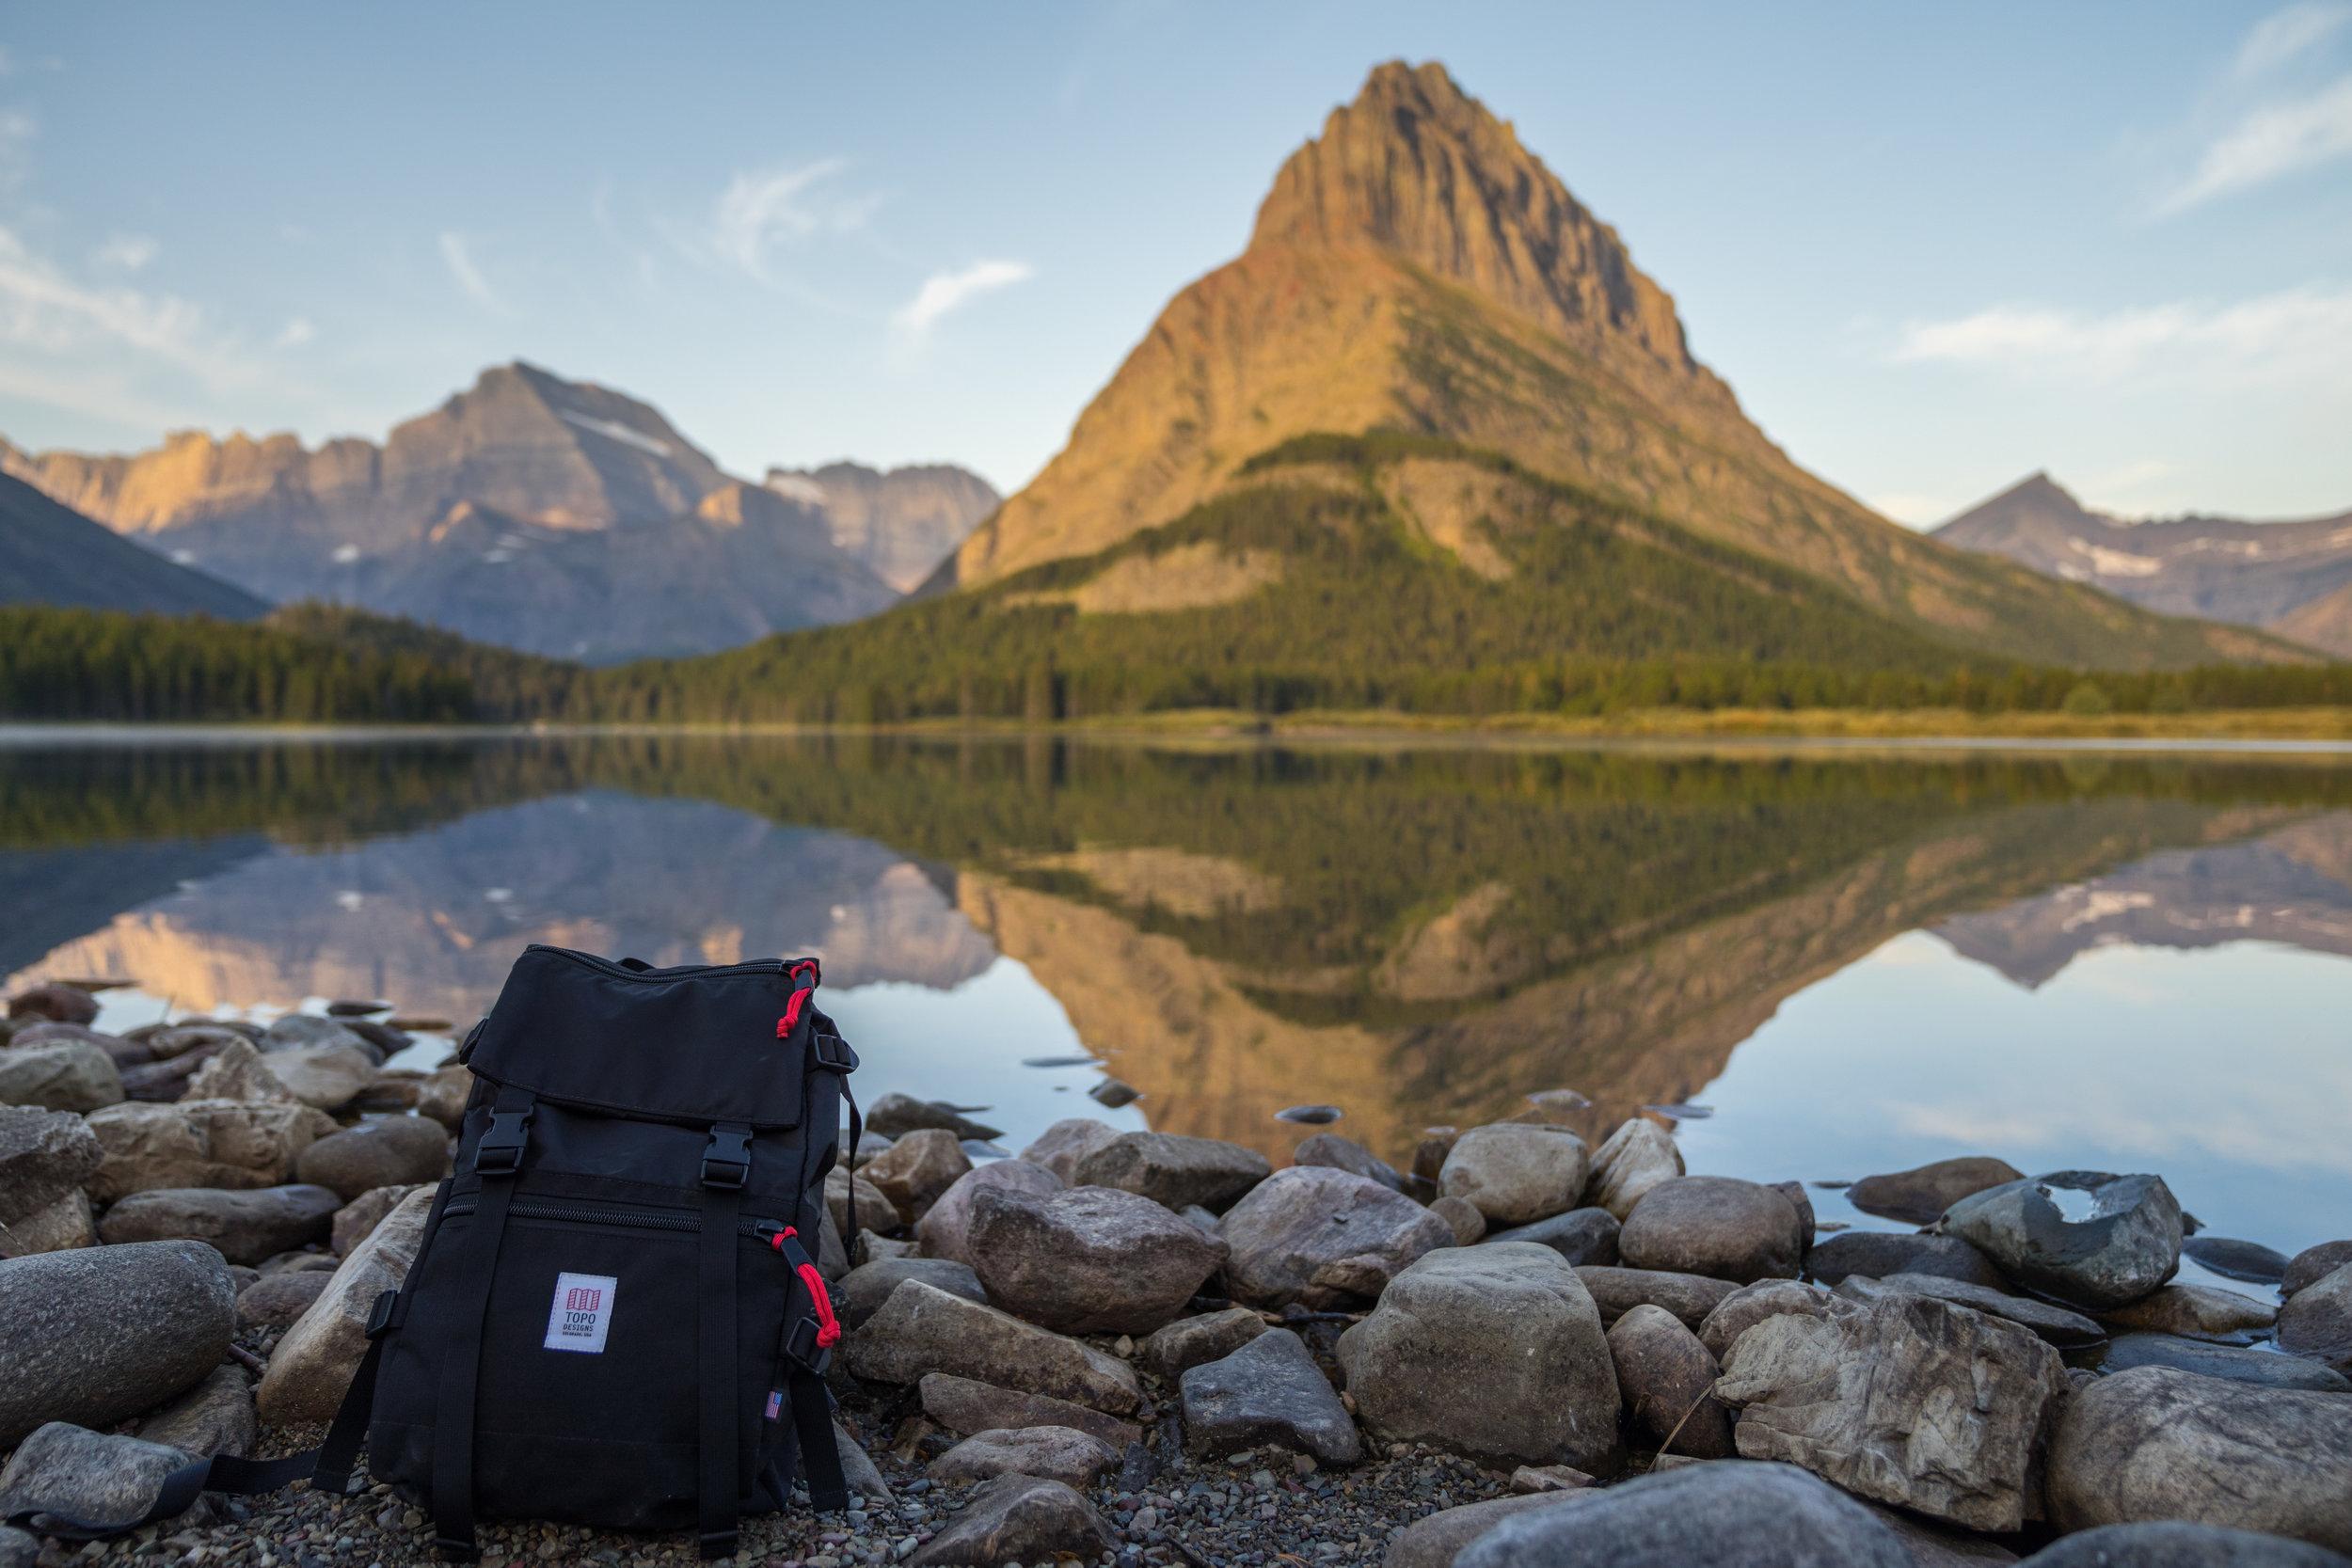 Backpacks.com Ambassadorship